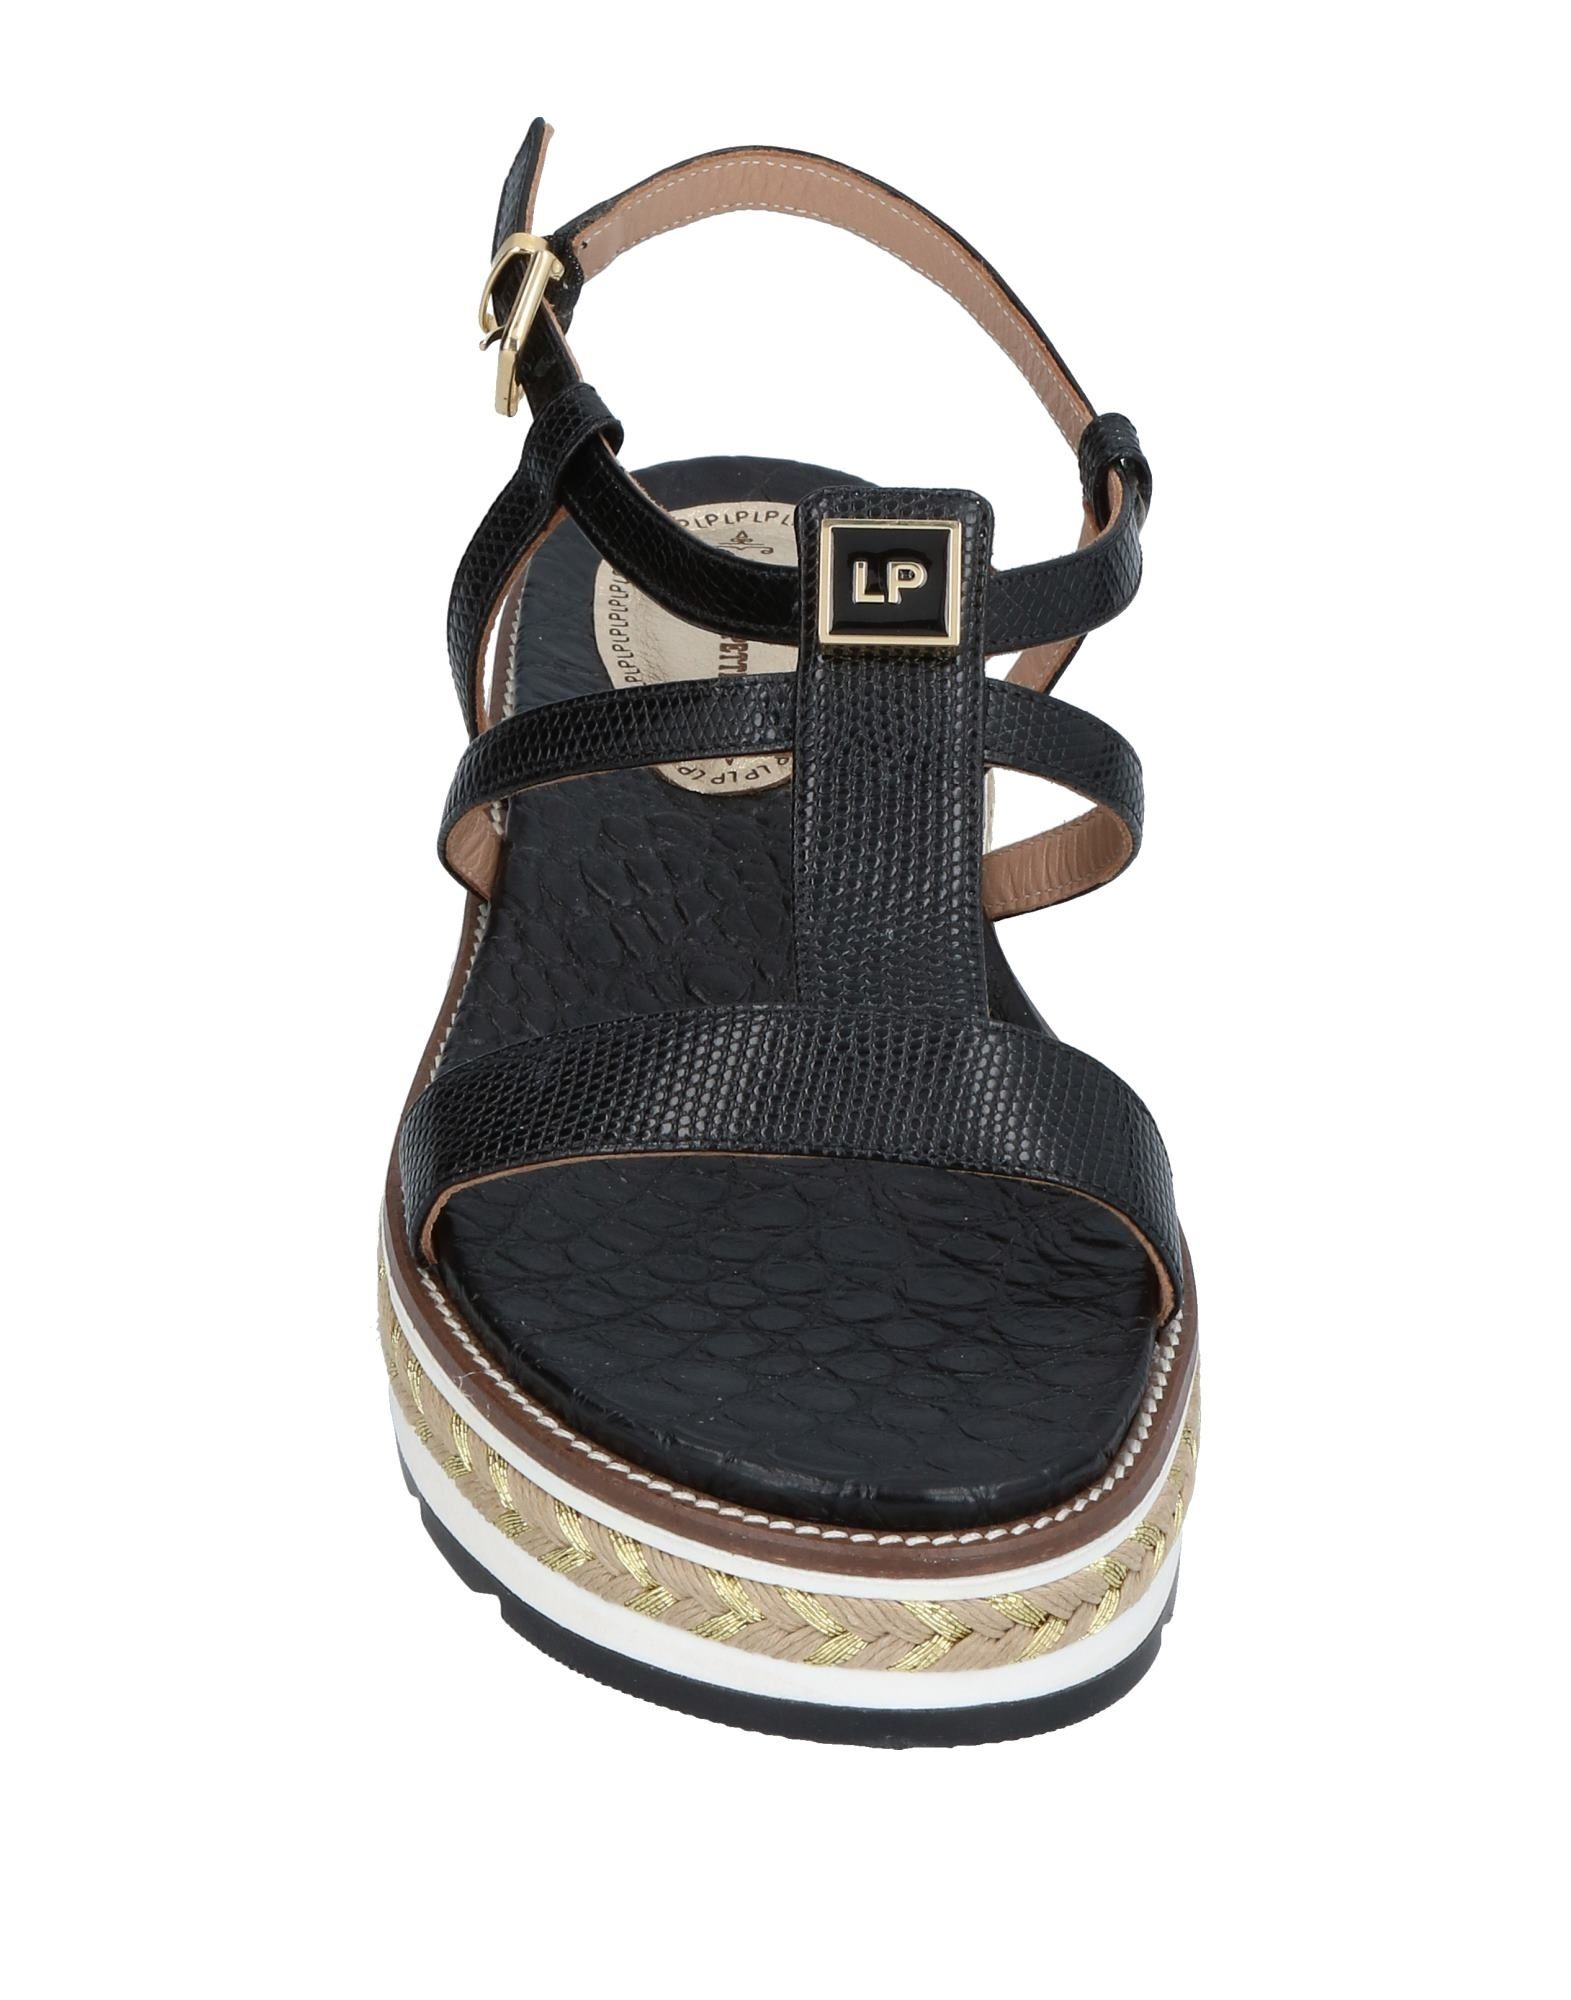 Loretta Pettinari Sandalen Damen  11387911XD Gute Qualität beliebte Schuhe